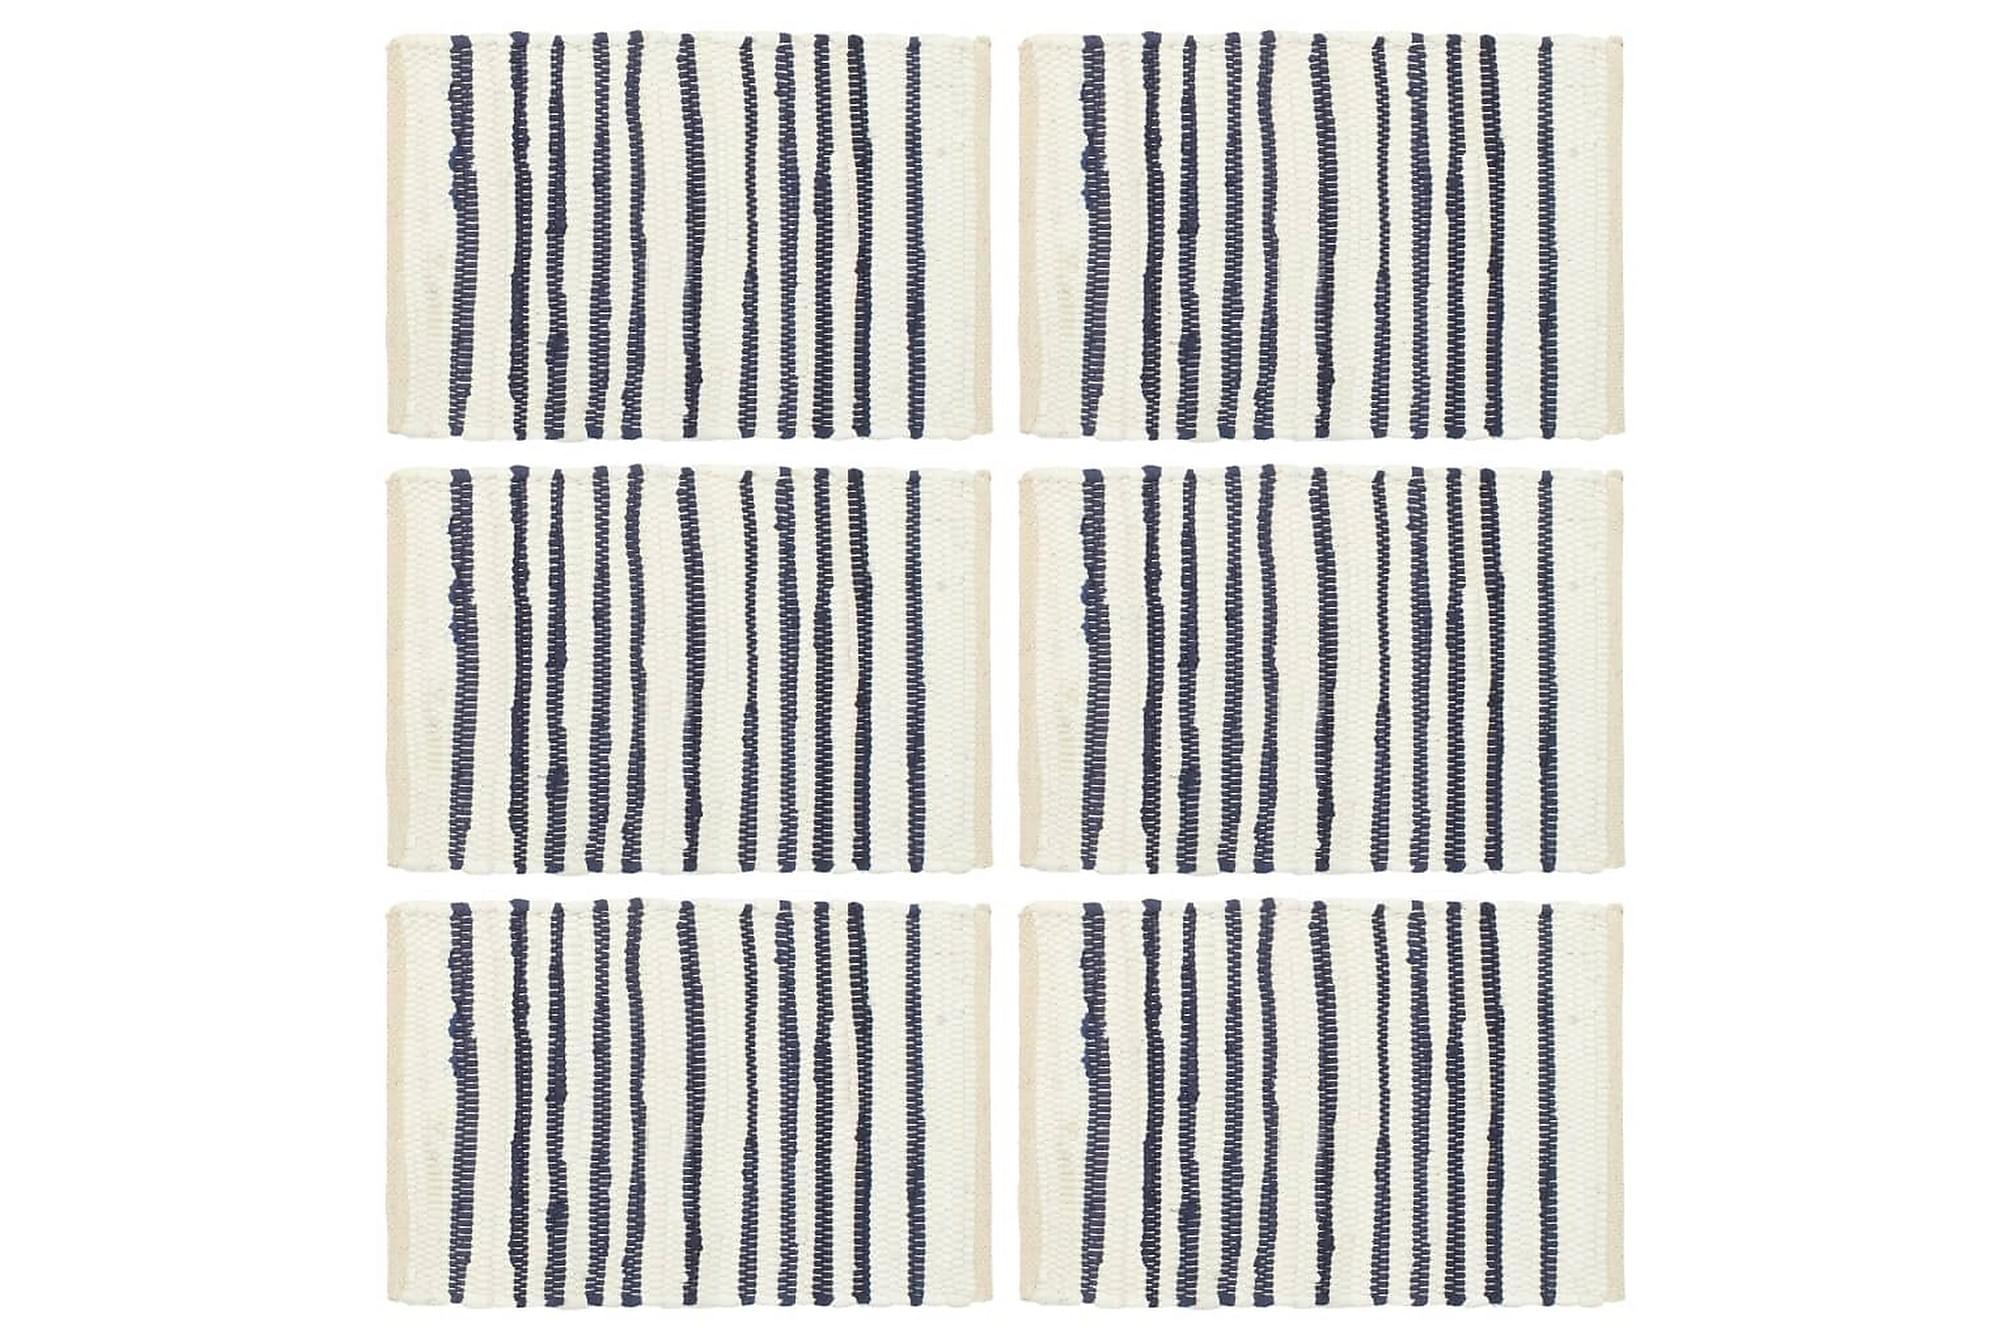 Bordstabletter 6 st blå och vit 30x45 cm bomull, Kökstextilier